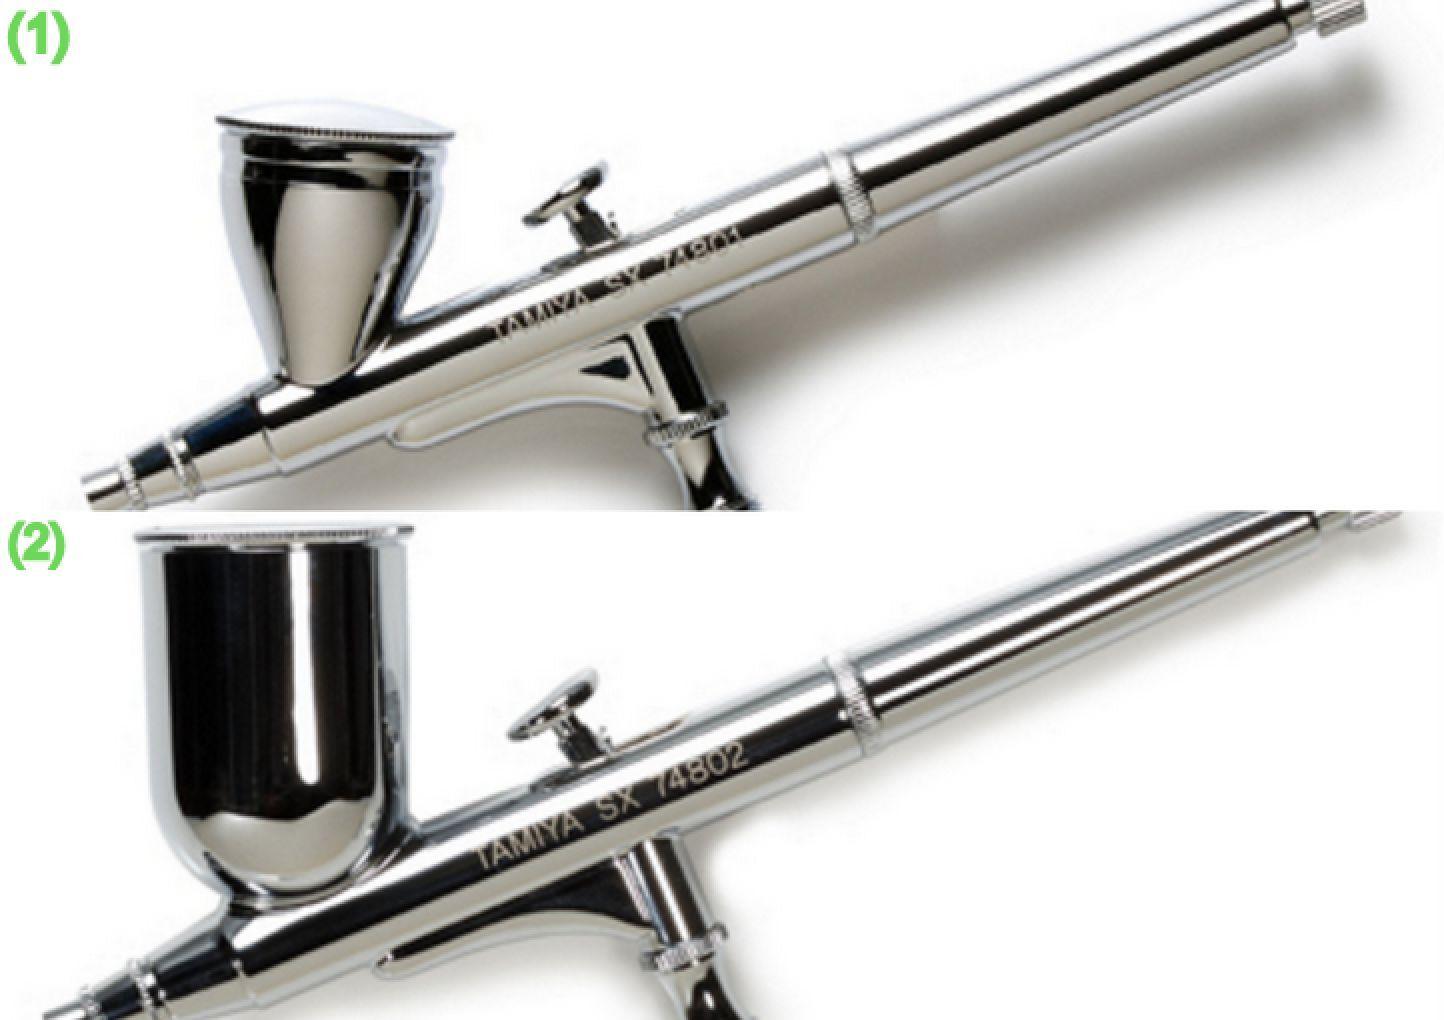 Tamiya Model Craft Tools - Sparmax Airbrush SX0.3D 74801 Sx0.5D 74802